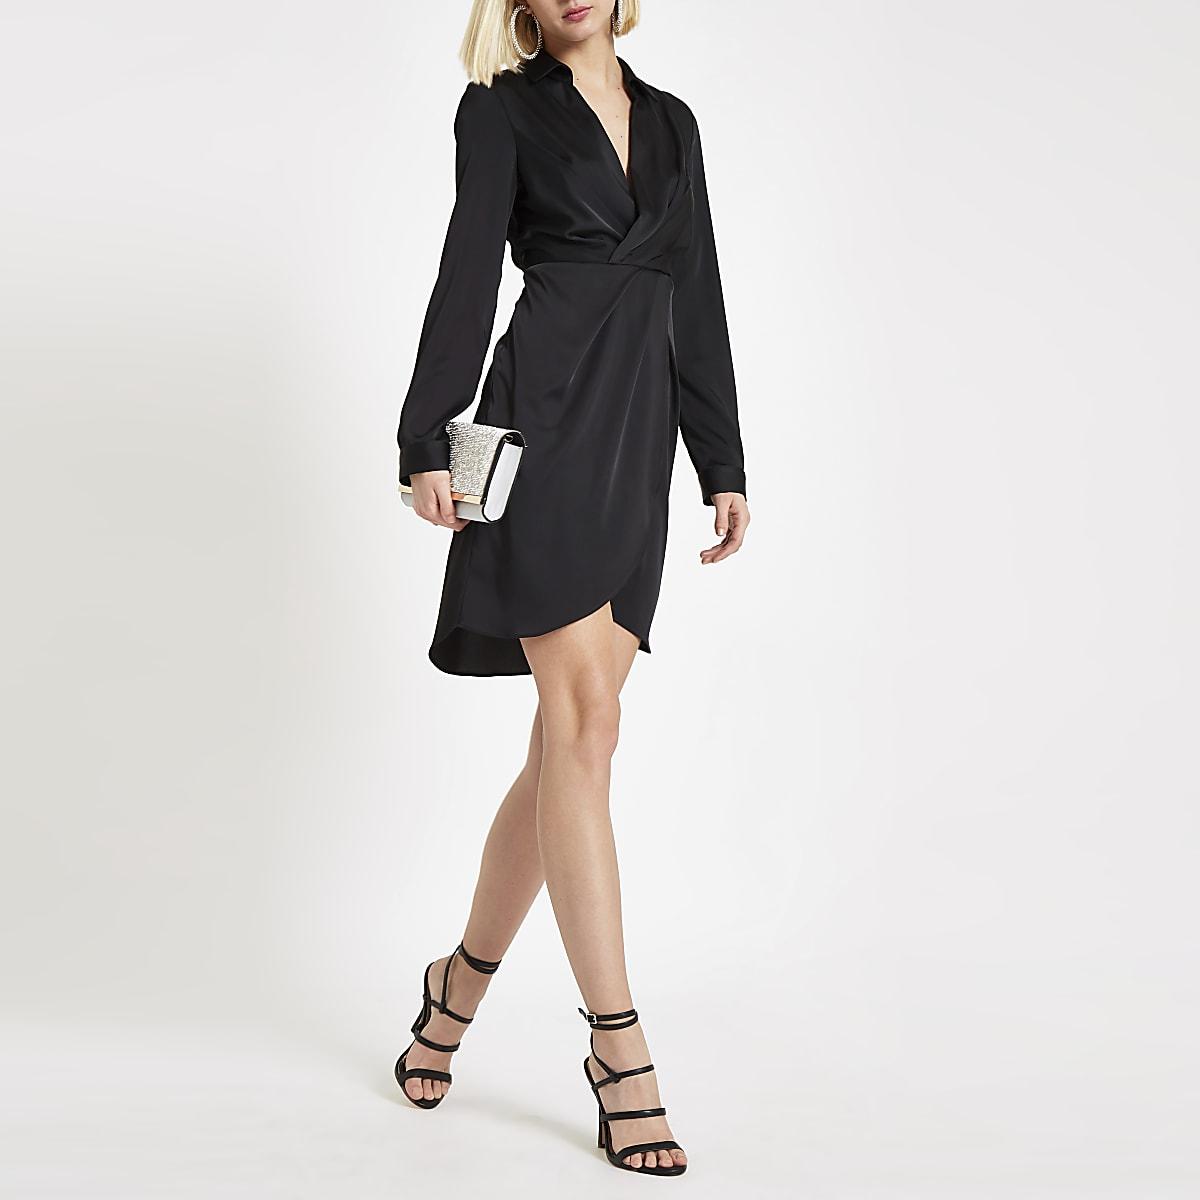 2762e3db8f Robe chemise portefeuille noire - Robes chemises - Robes - Femme